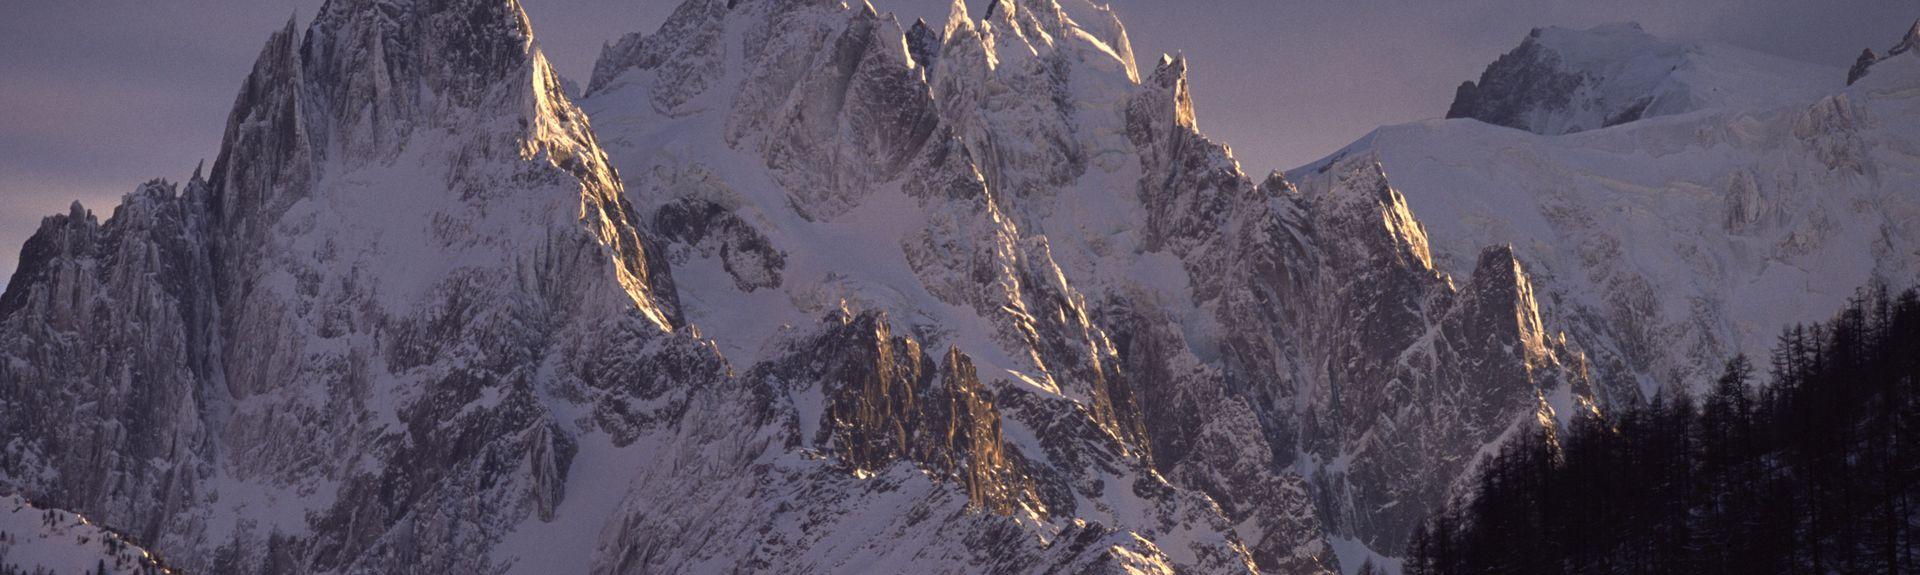 Skilift di Avoriaz, Morzine, Alvernia-Rodano-Alpi, Francia